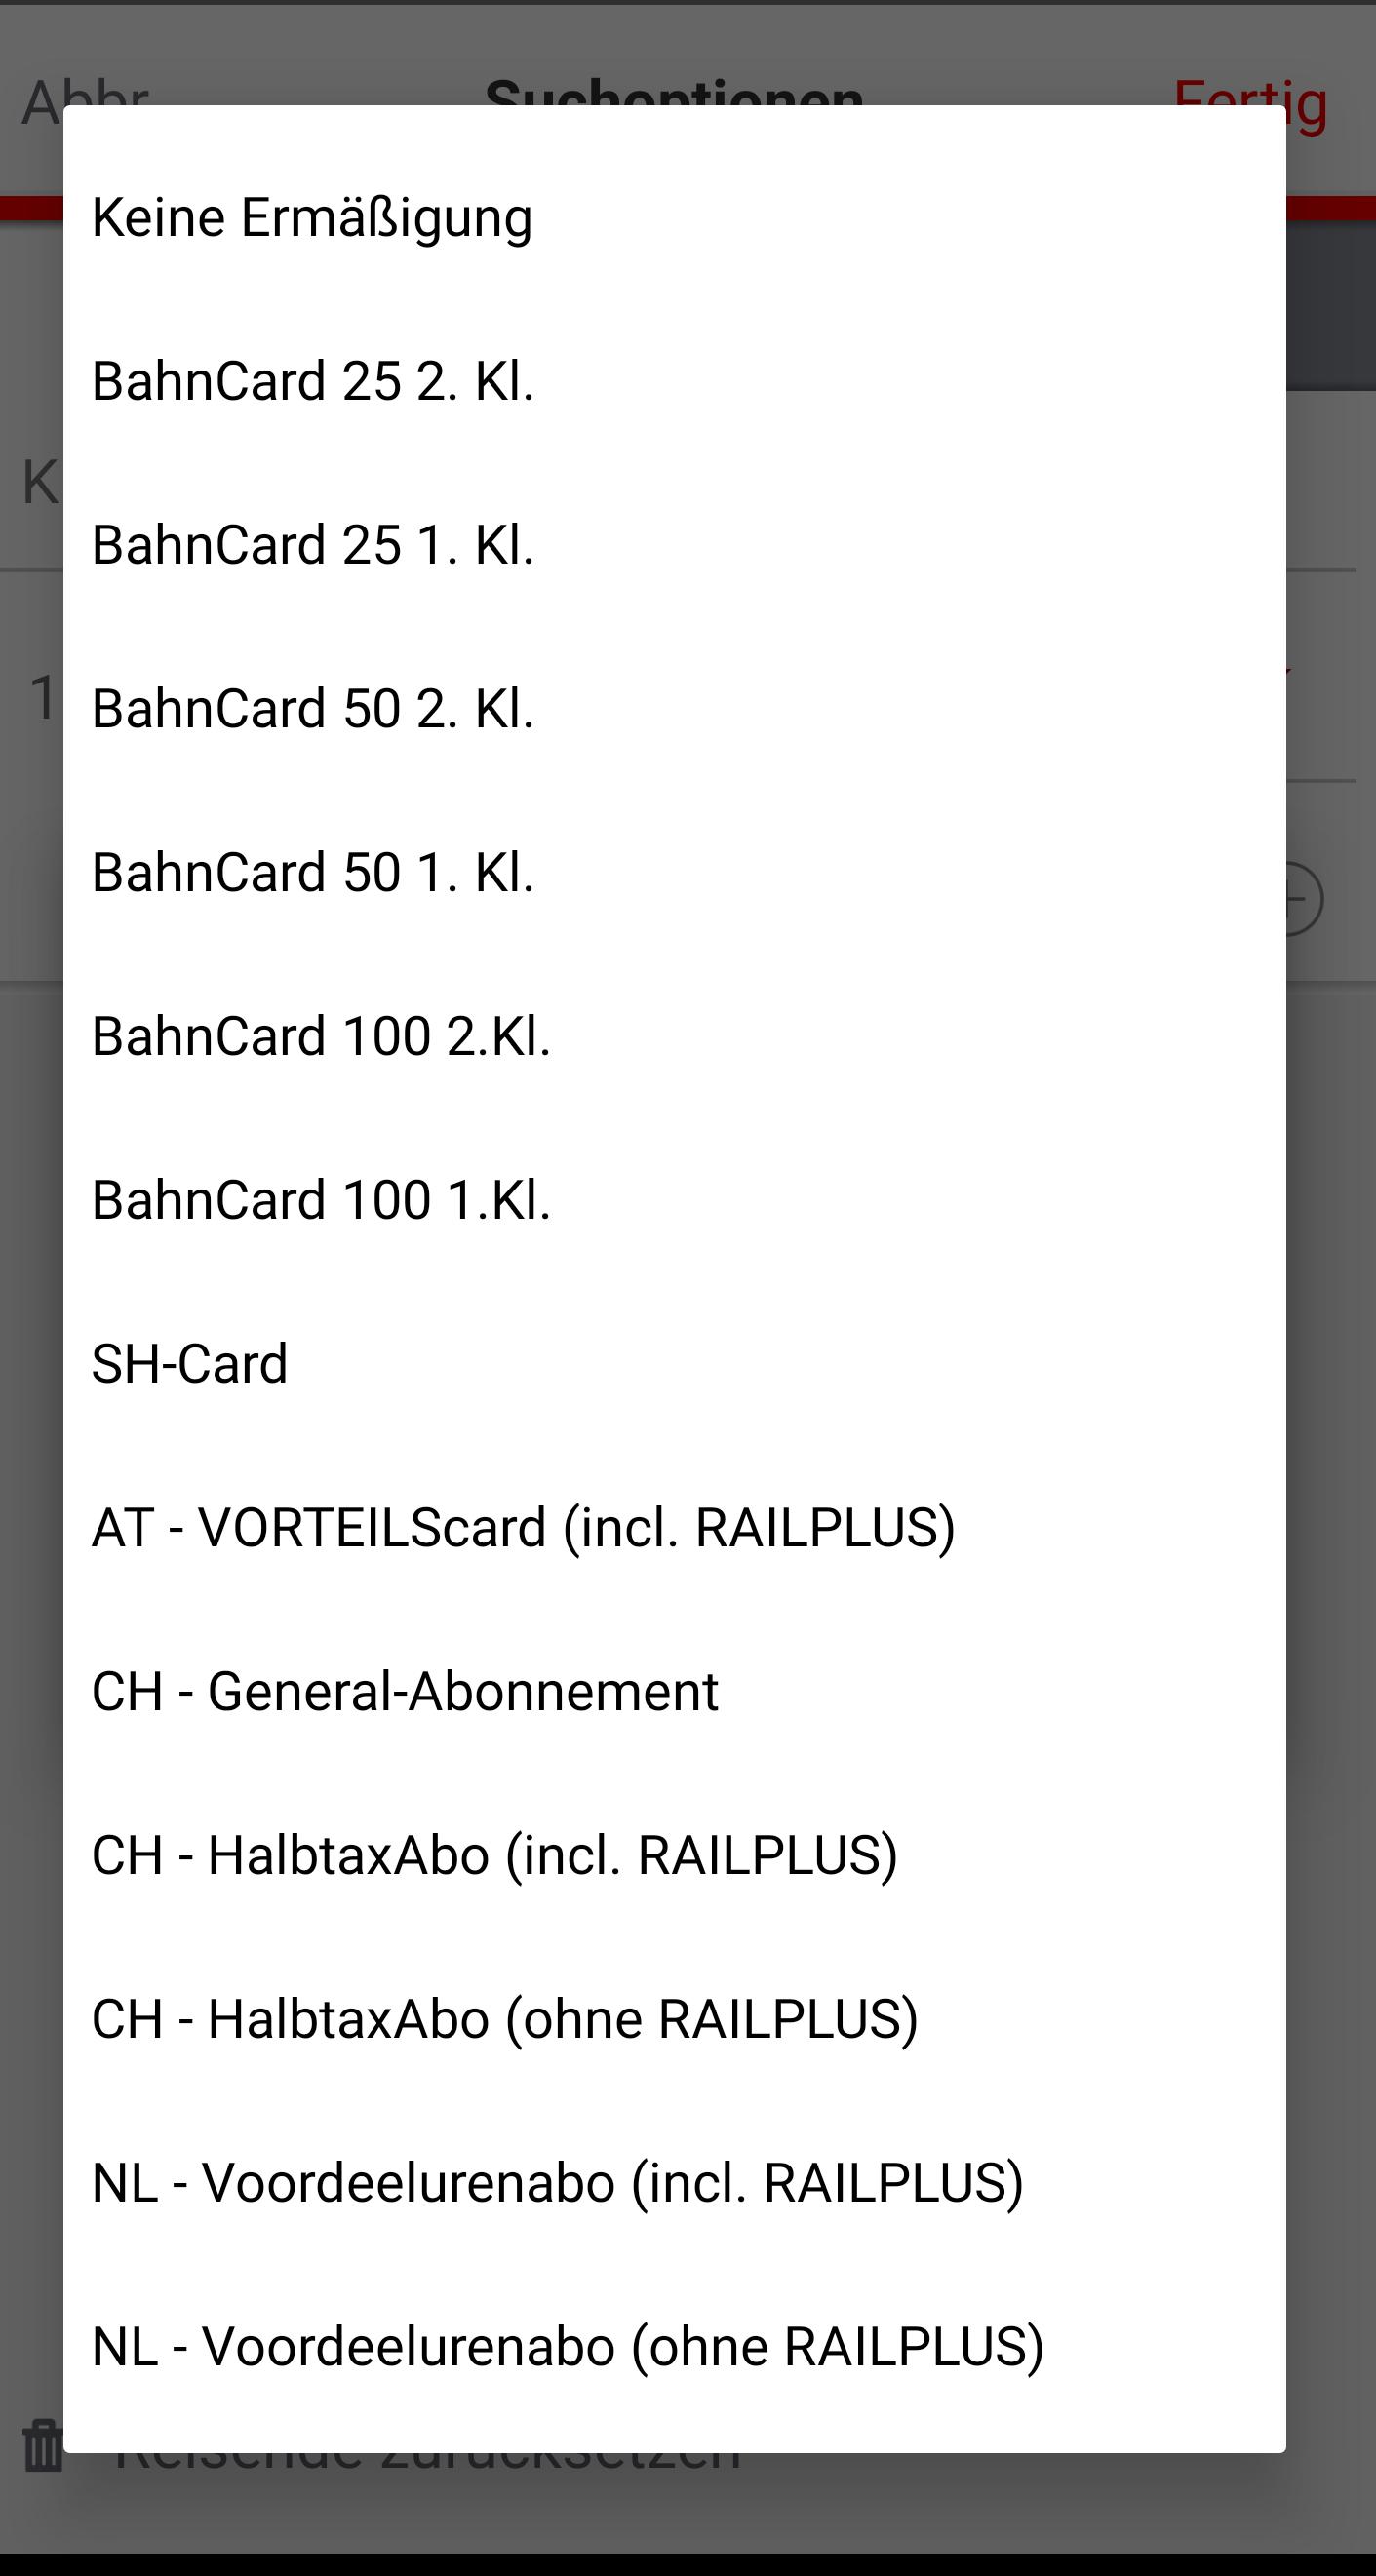 BahnCard100 ist jetzt bei Fahrten ins Ausland angebbar